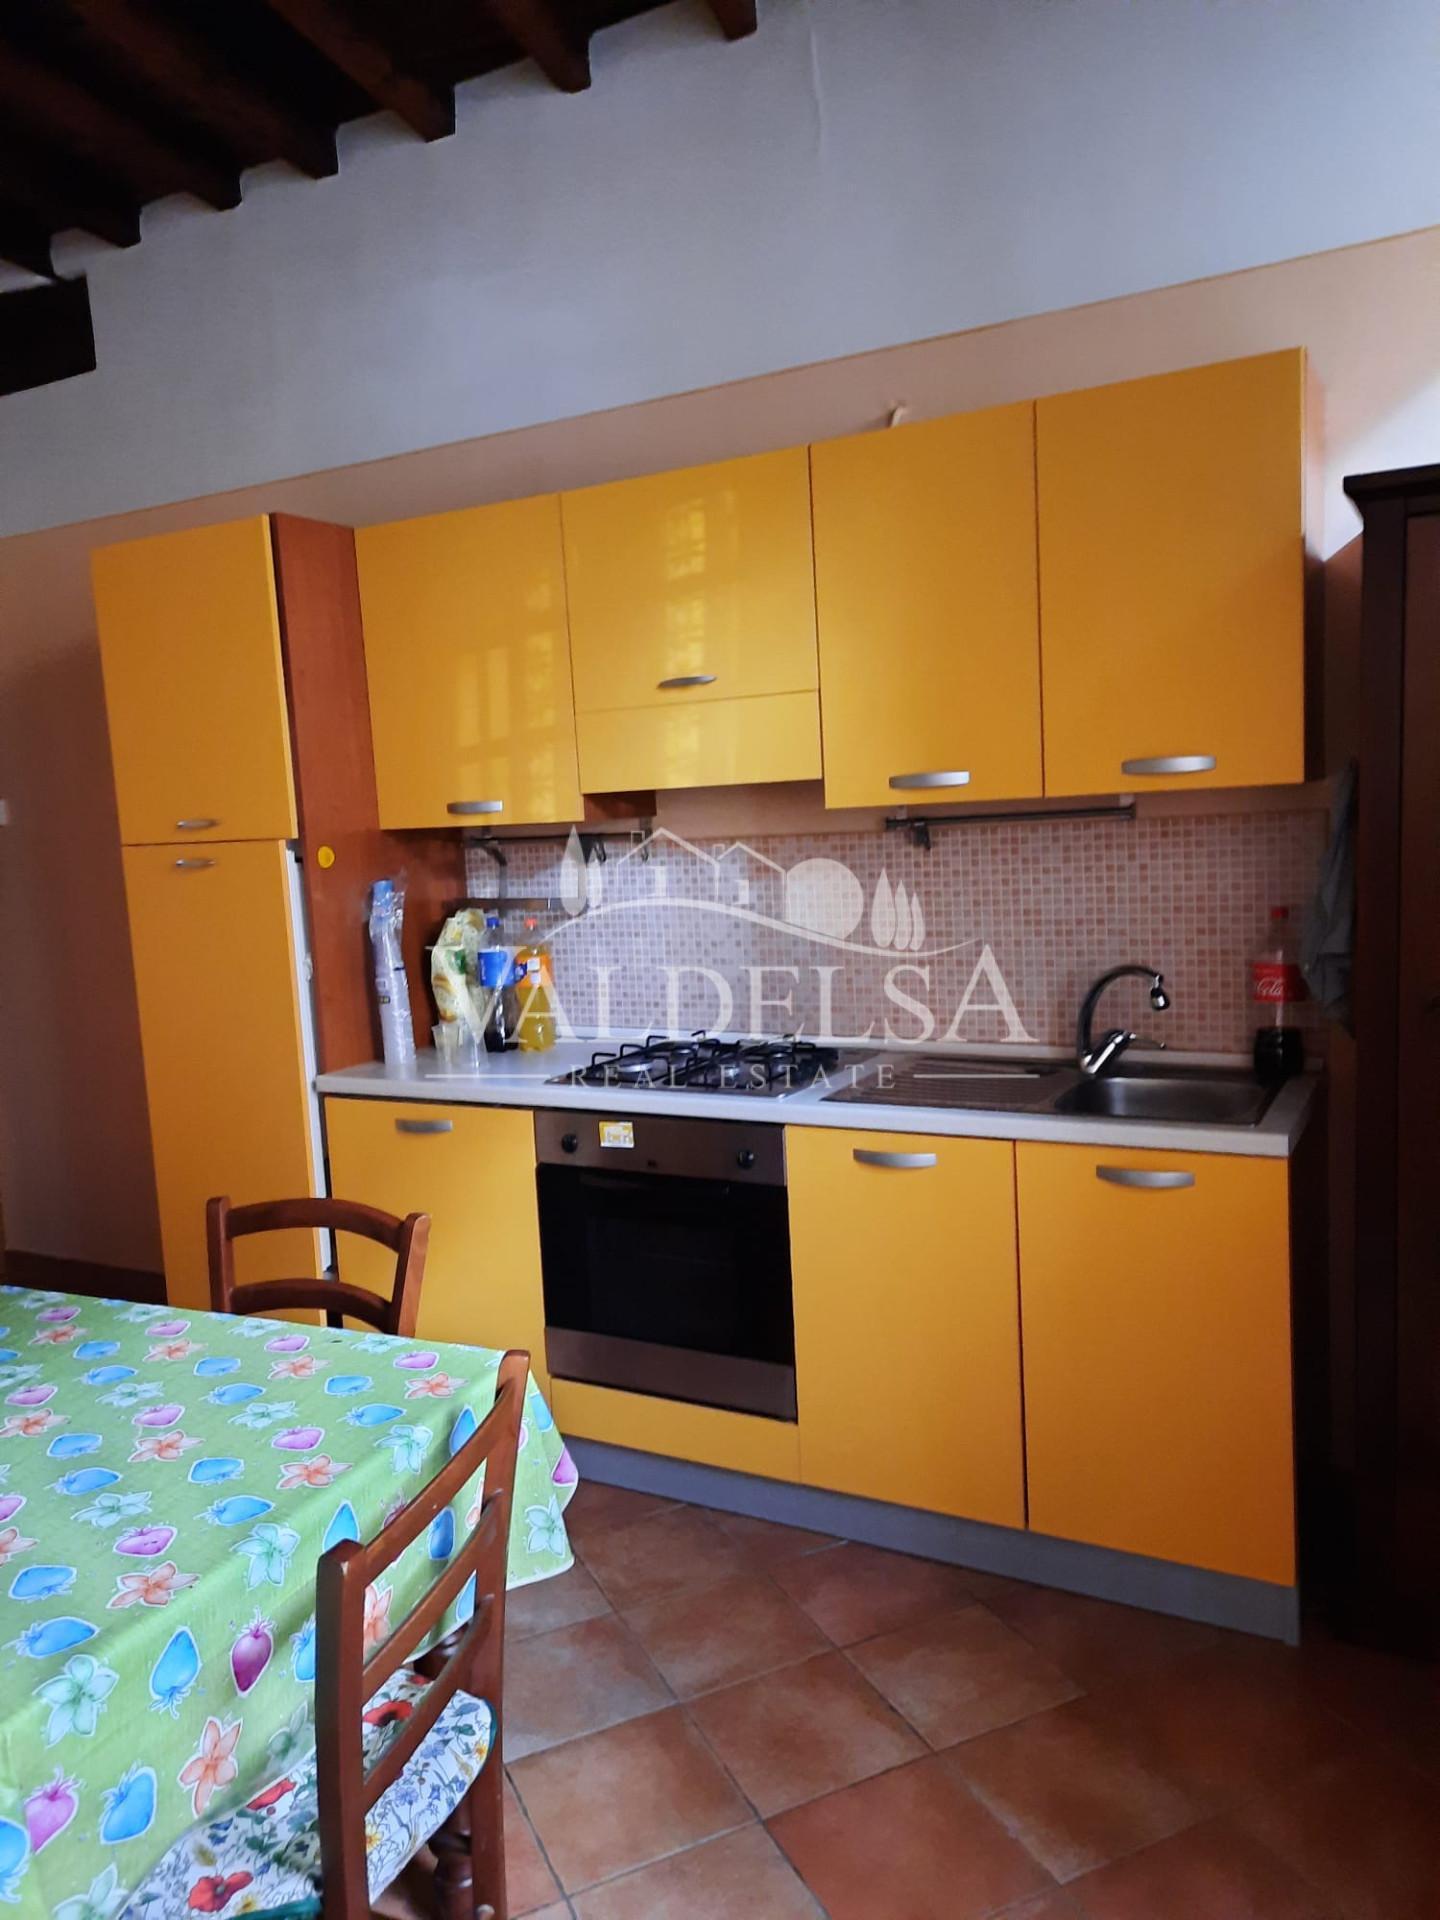 Apartment for rent in Barberino Val d'Elsa (FI)